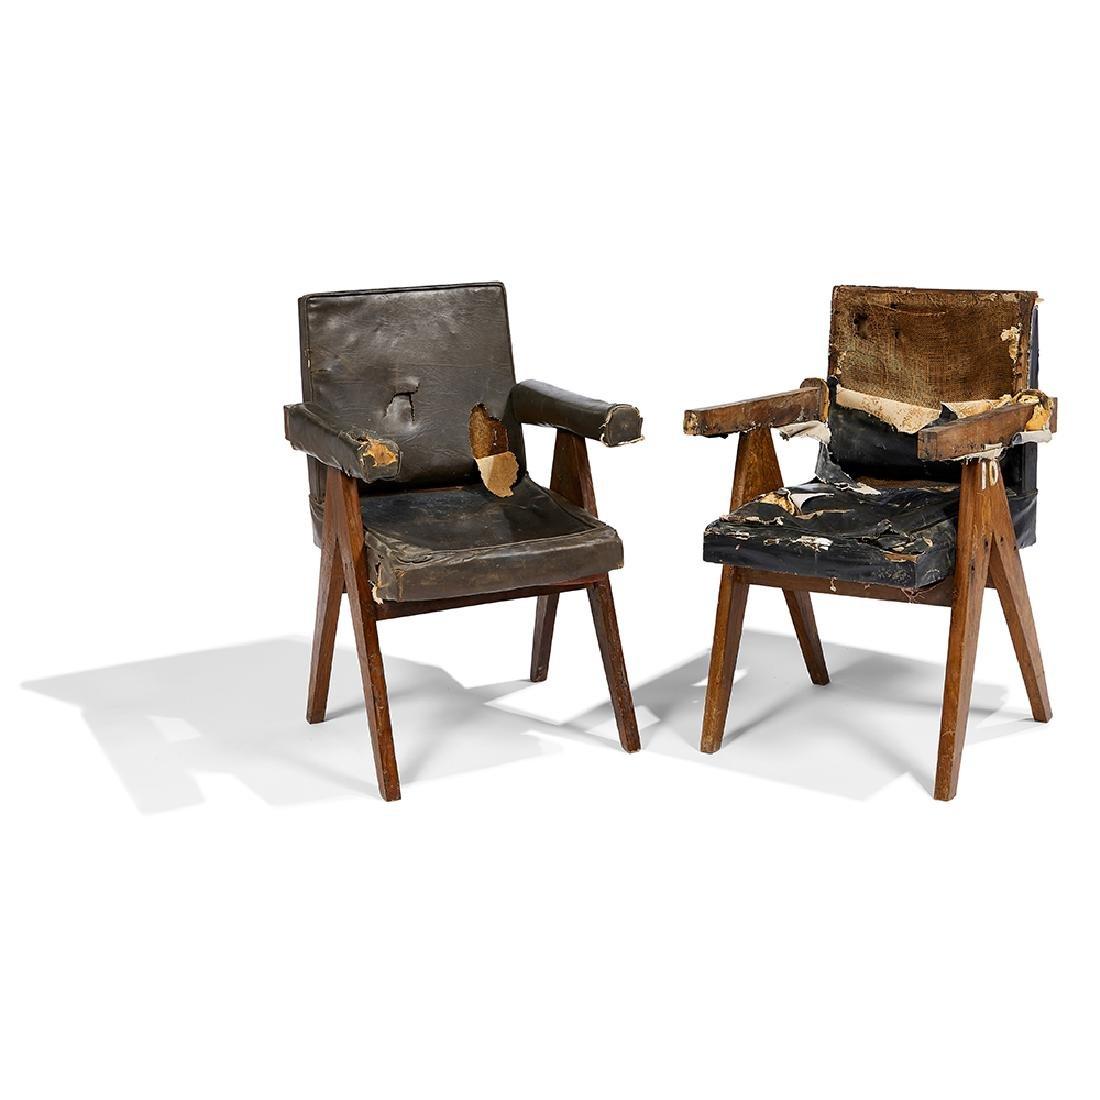 Pierre Jeanneret unrestored Committee Armchairs, pair - 2